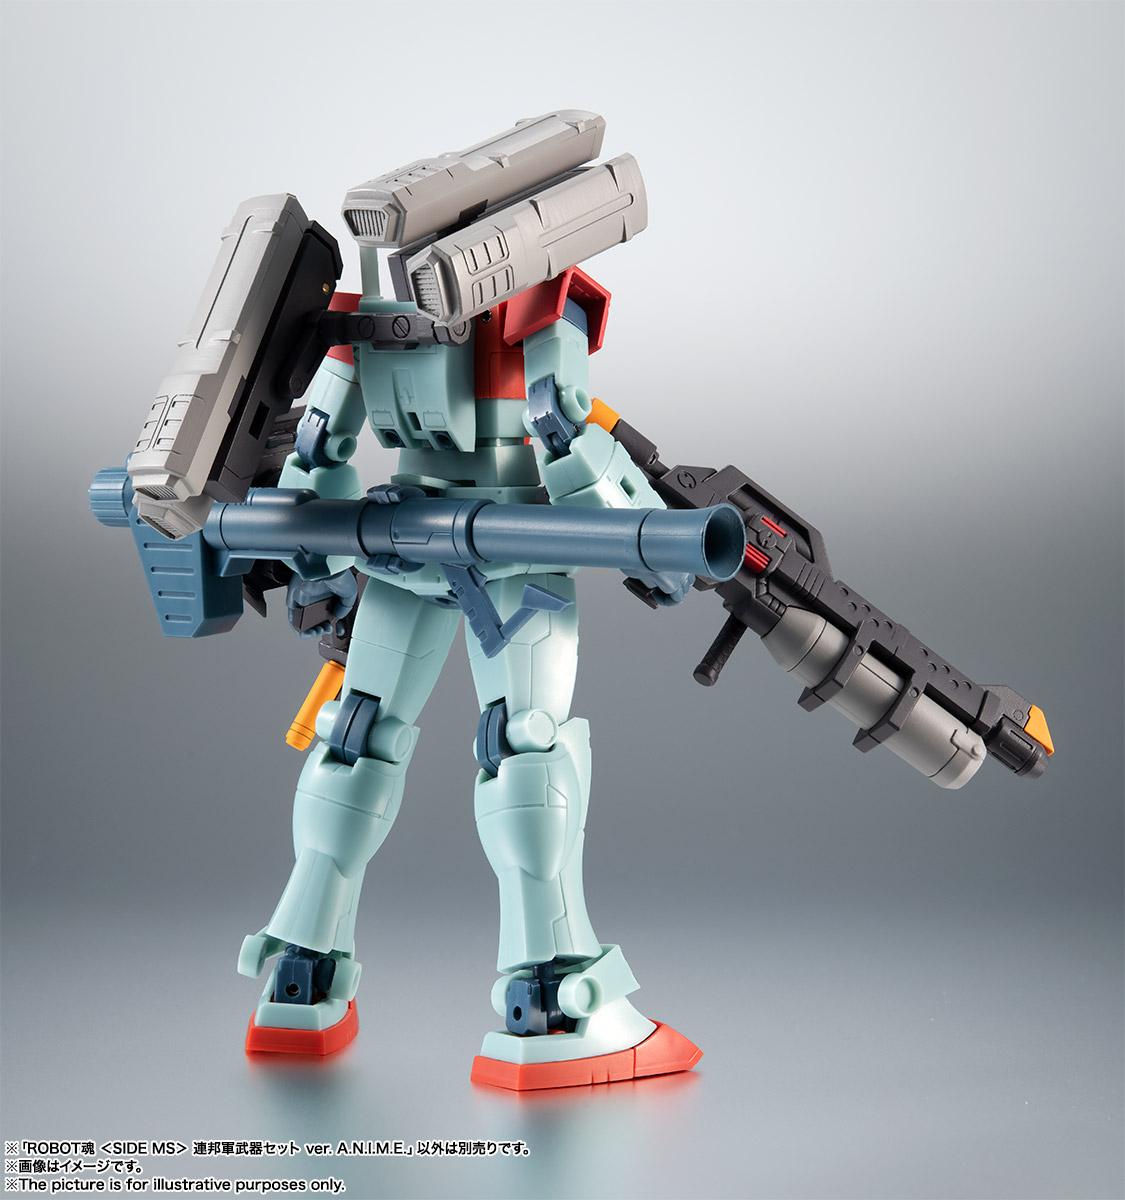 ROBOT魂〈SIDE MS〉『連邦軍武器セット ver. A.N.I.M.E.』ガンダム 完成品フィギュア-004